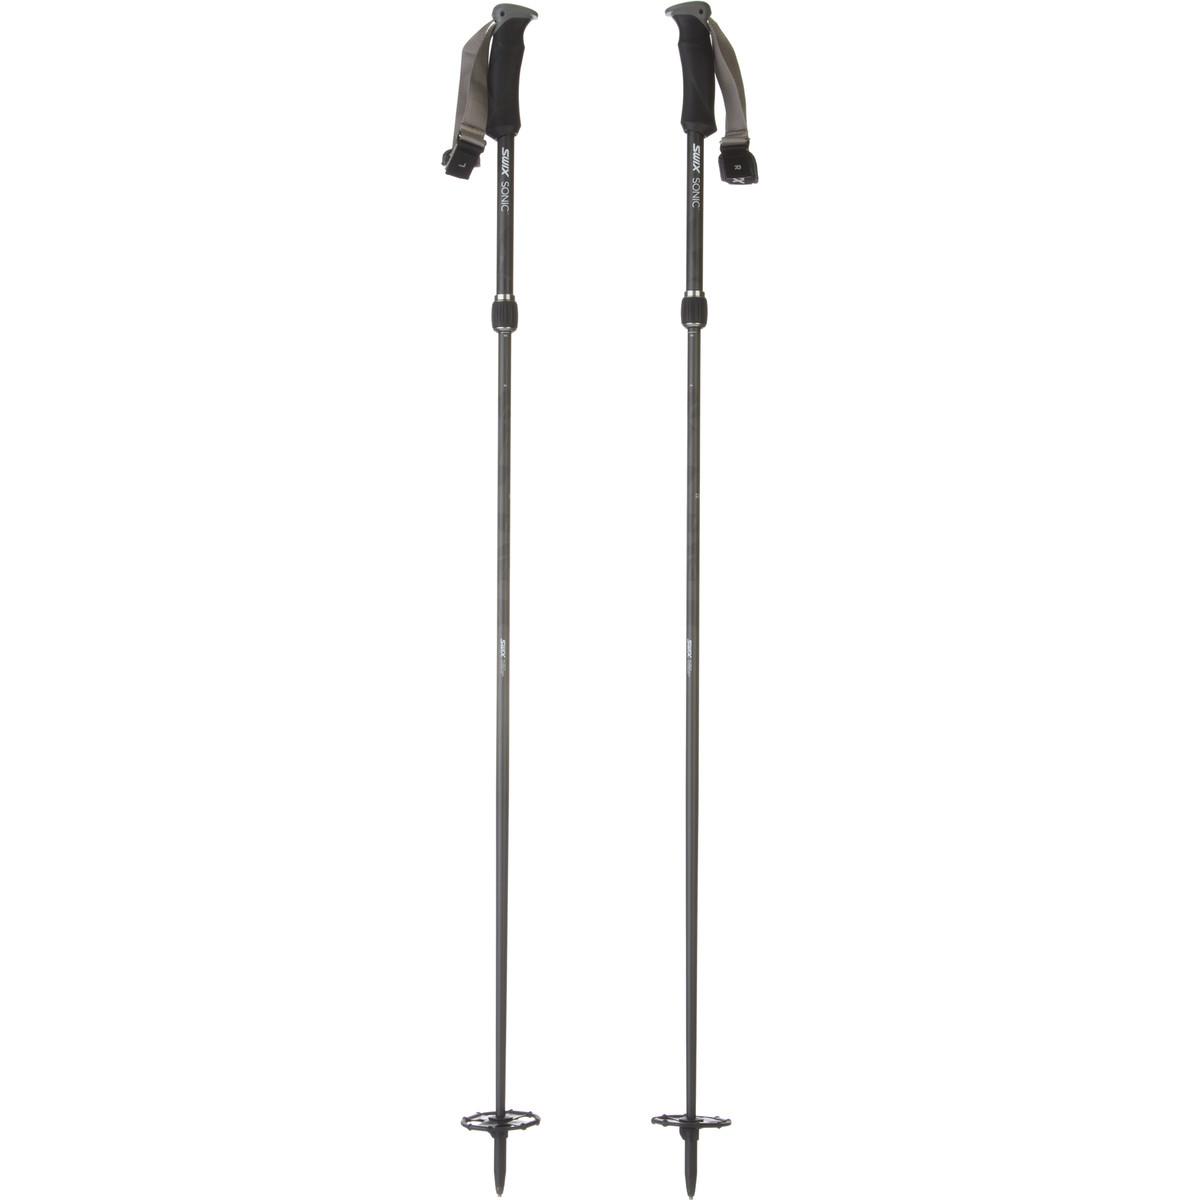 Swix Sonic R1 Carbon Ski Poles